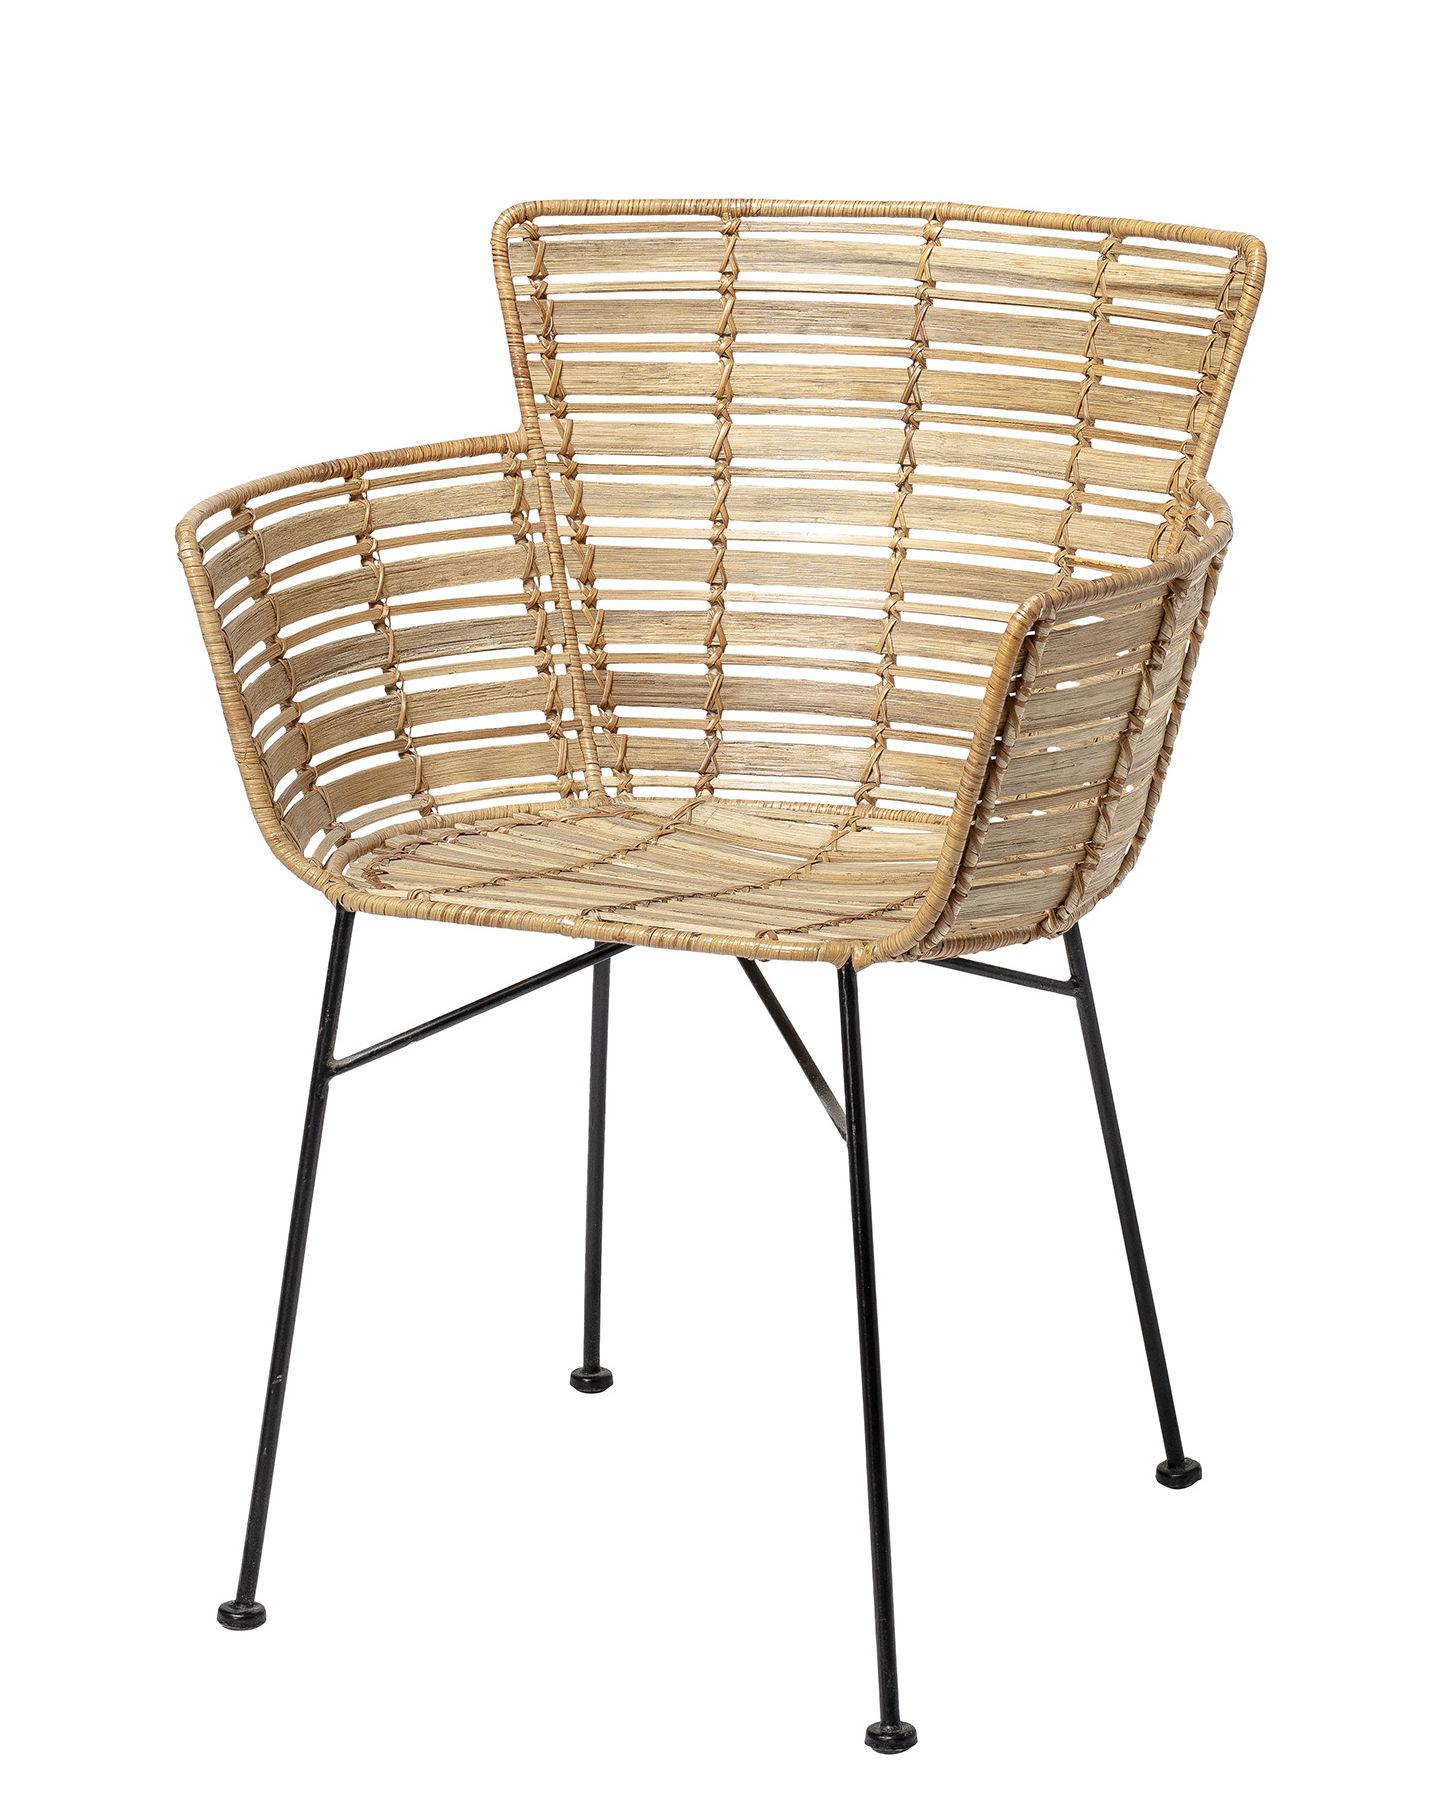 fauteuil coast bloomingville rotin naturel l 62 x h 80 made in design. Black Bedroom Furniture Sets. Home Design Ideas